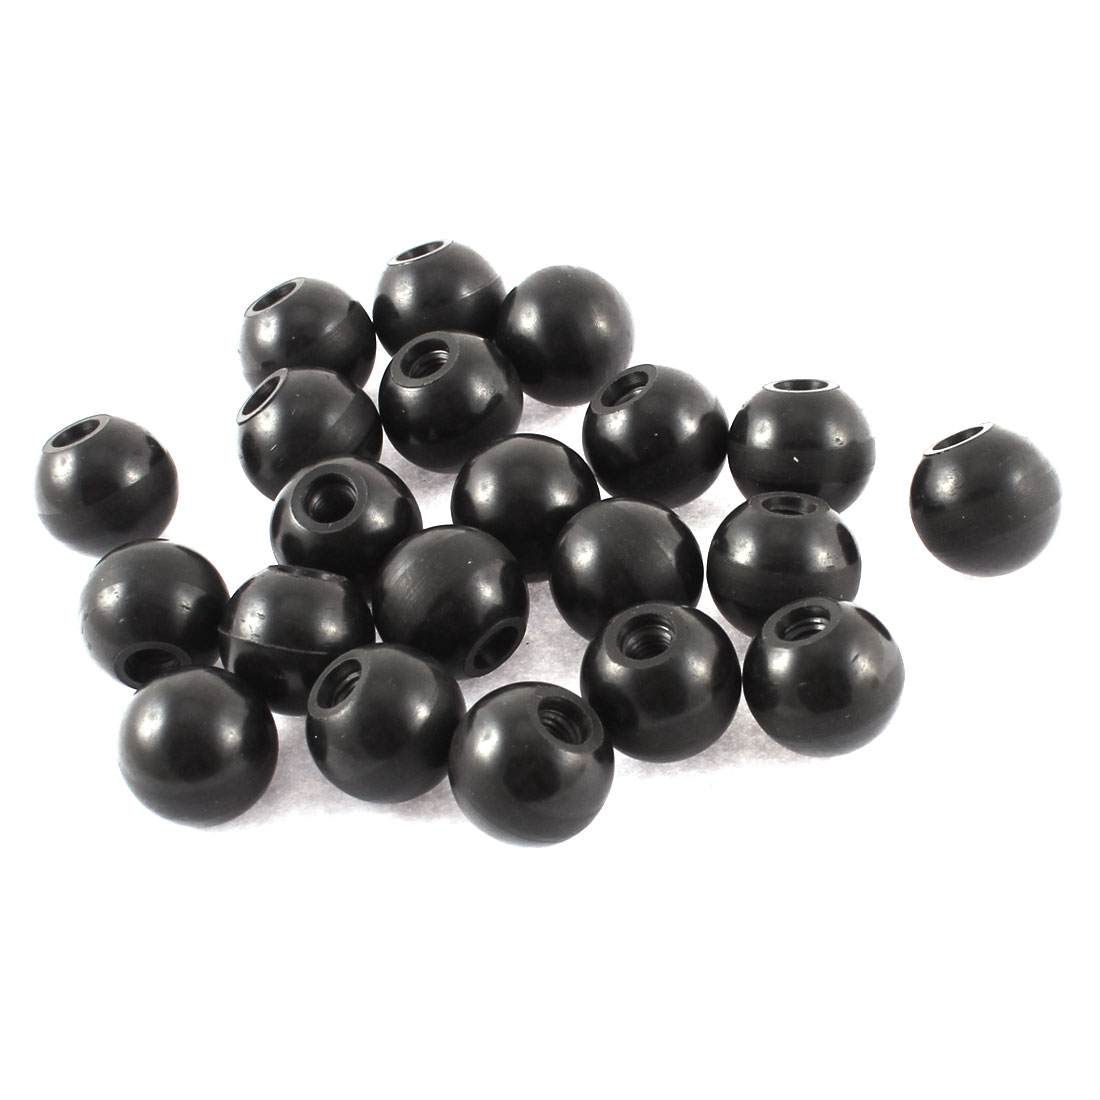 20mm Diameter M5 Thread Black Plastic Ball Handle Knob 21pcs